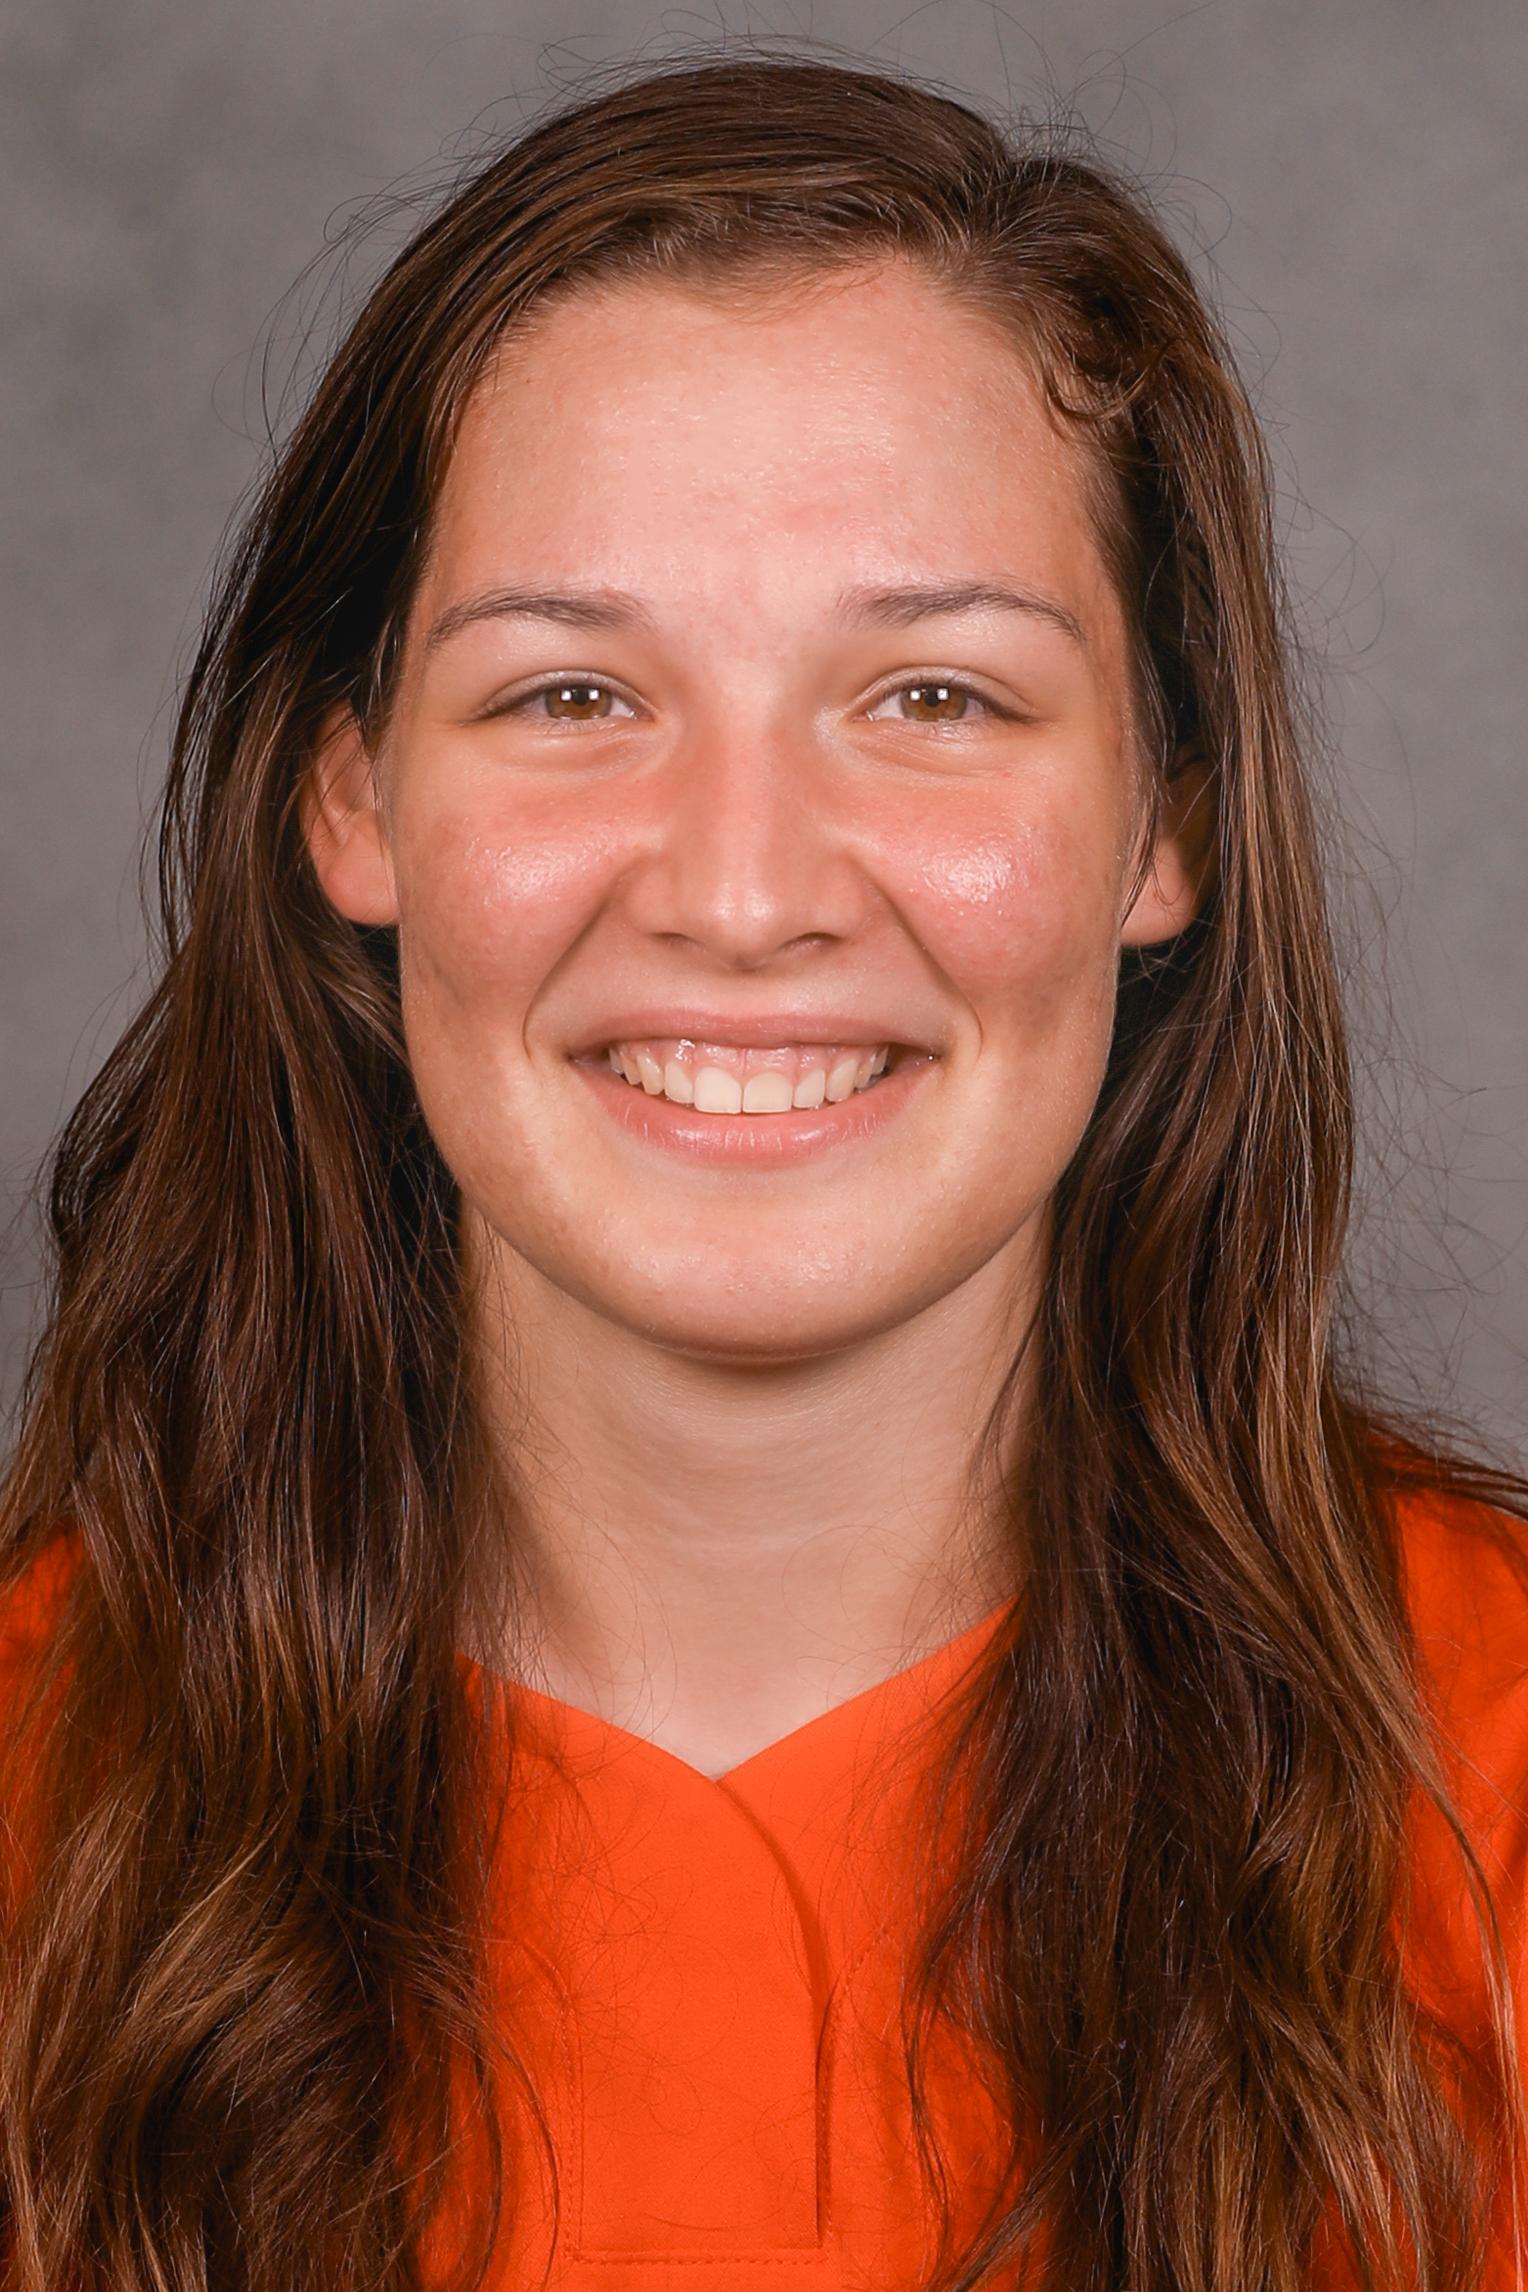 Valerie Cagle - Softball - Clemson University Athletics